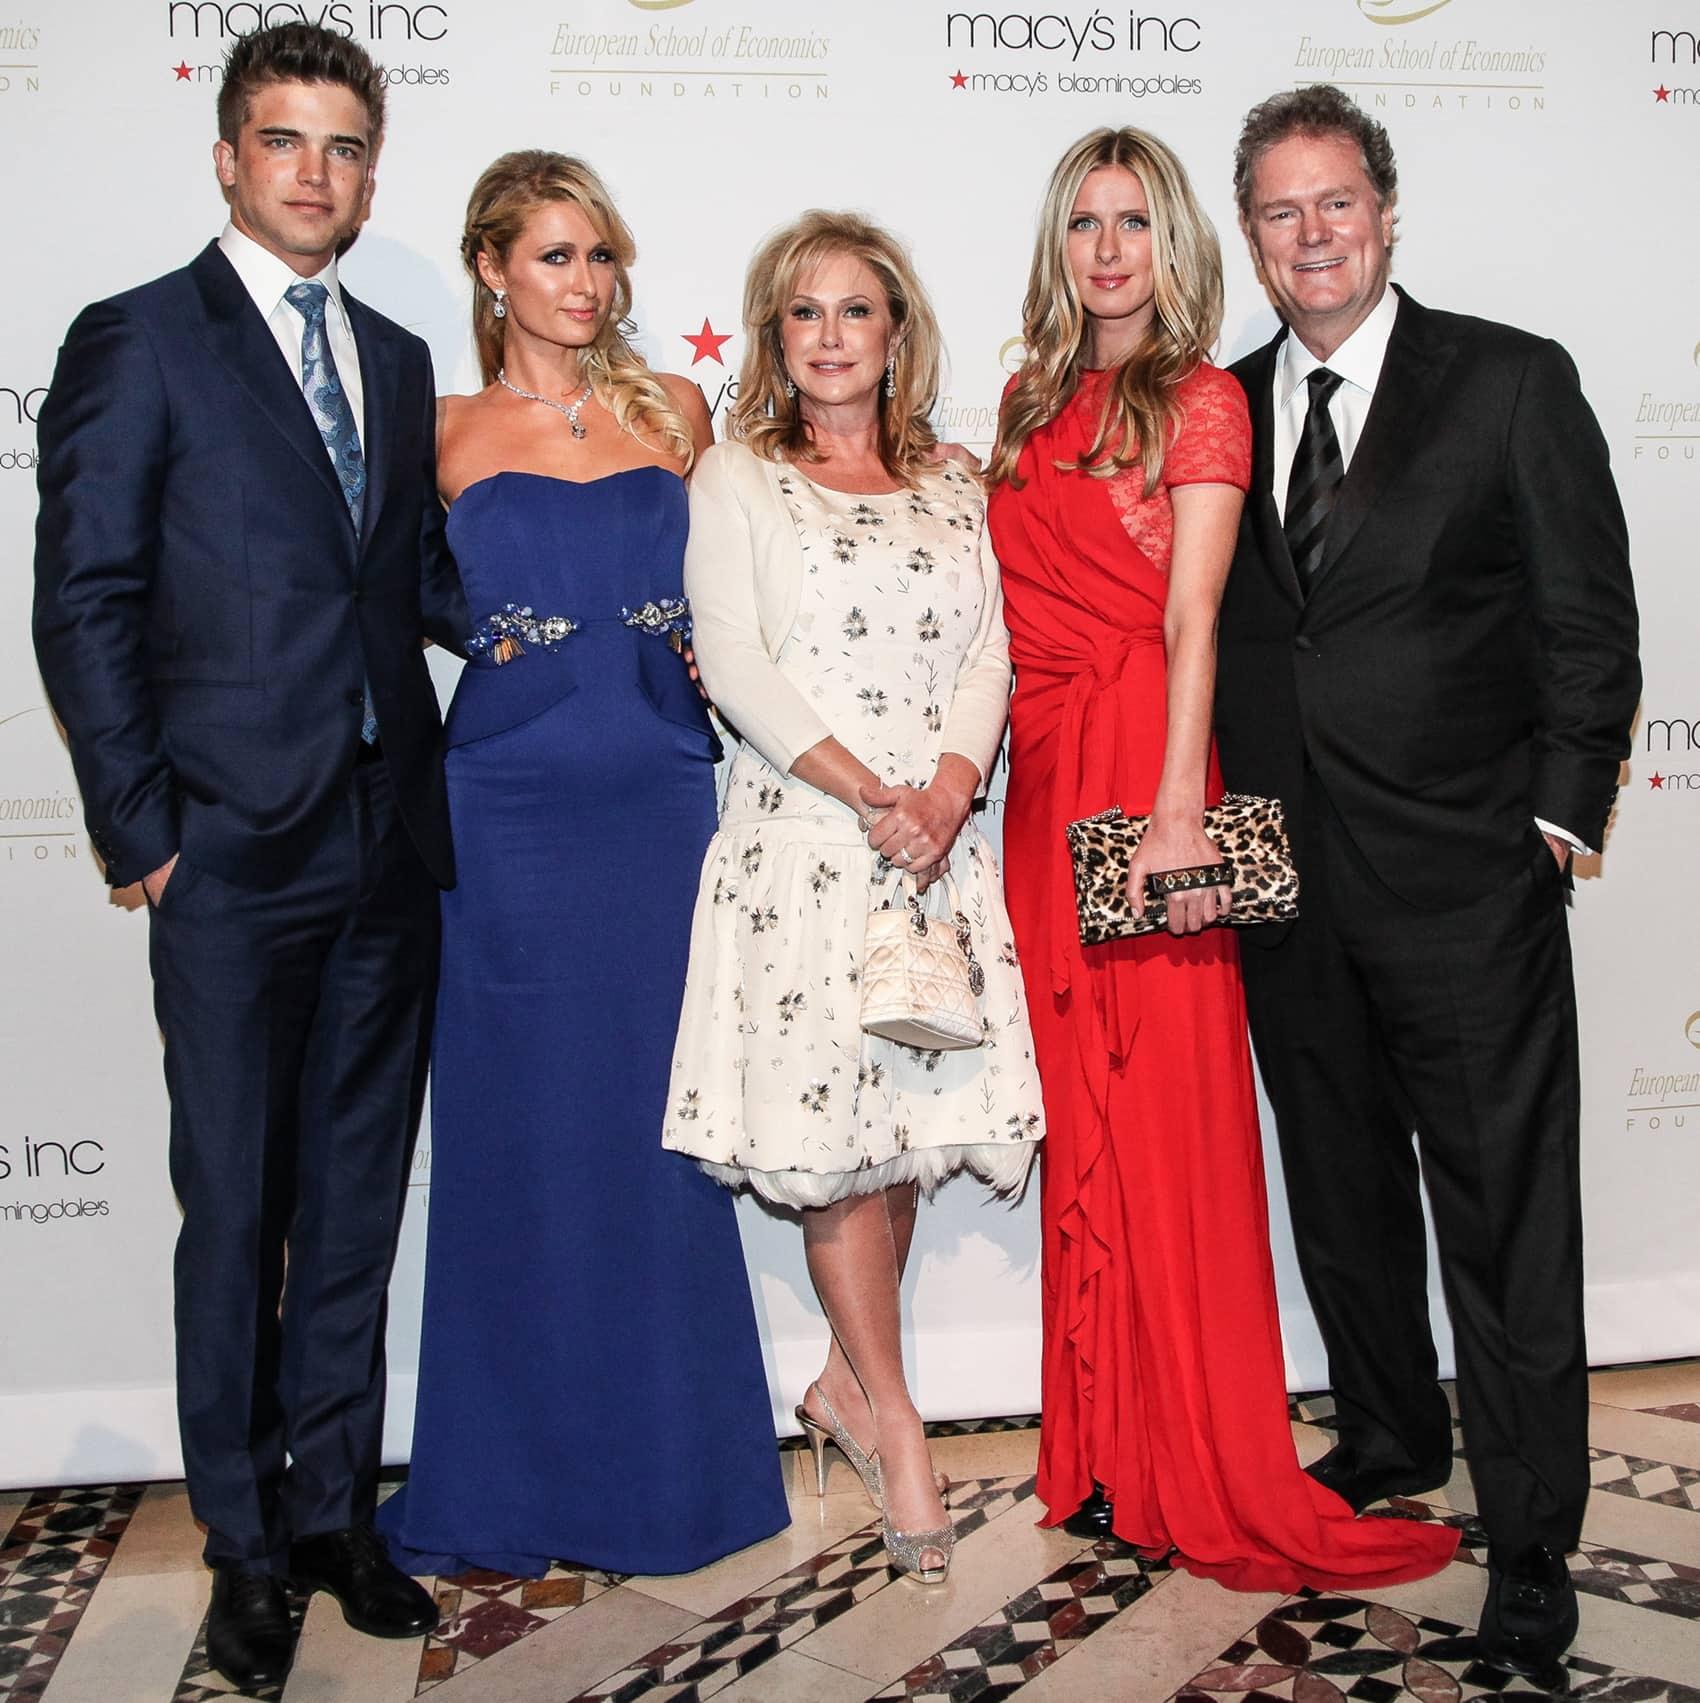 Spanish model River Viiperi, Paris Hilton, Kathy Hilton, Nicky Nilton, and Rick Hilton attend European School Of Economics Foundation Vision And Reality Awards